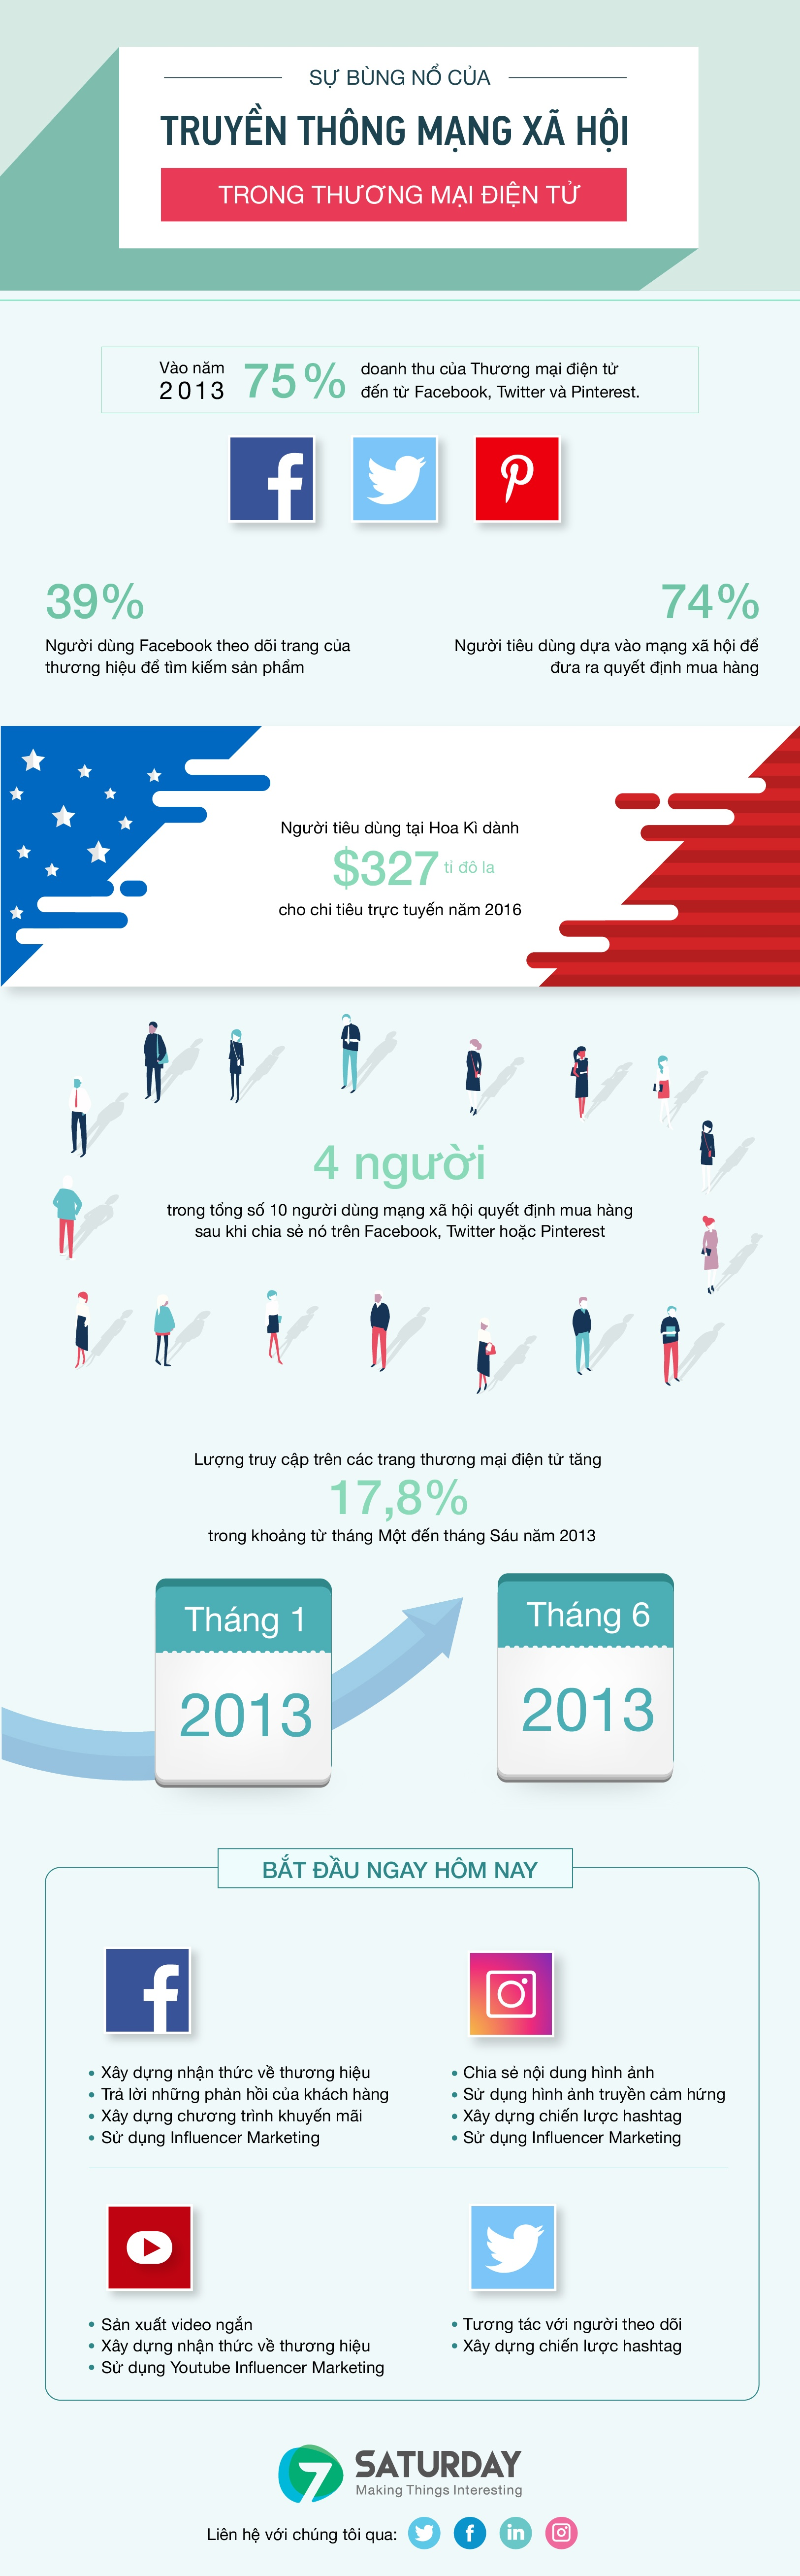 Infographic_BungnoMXH ver 2-01 (1).jpg